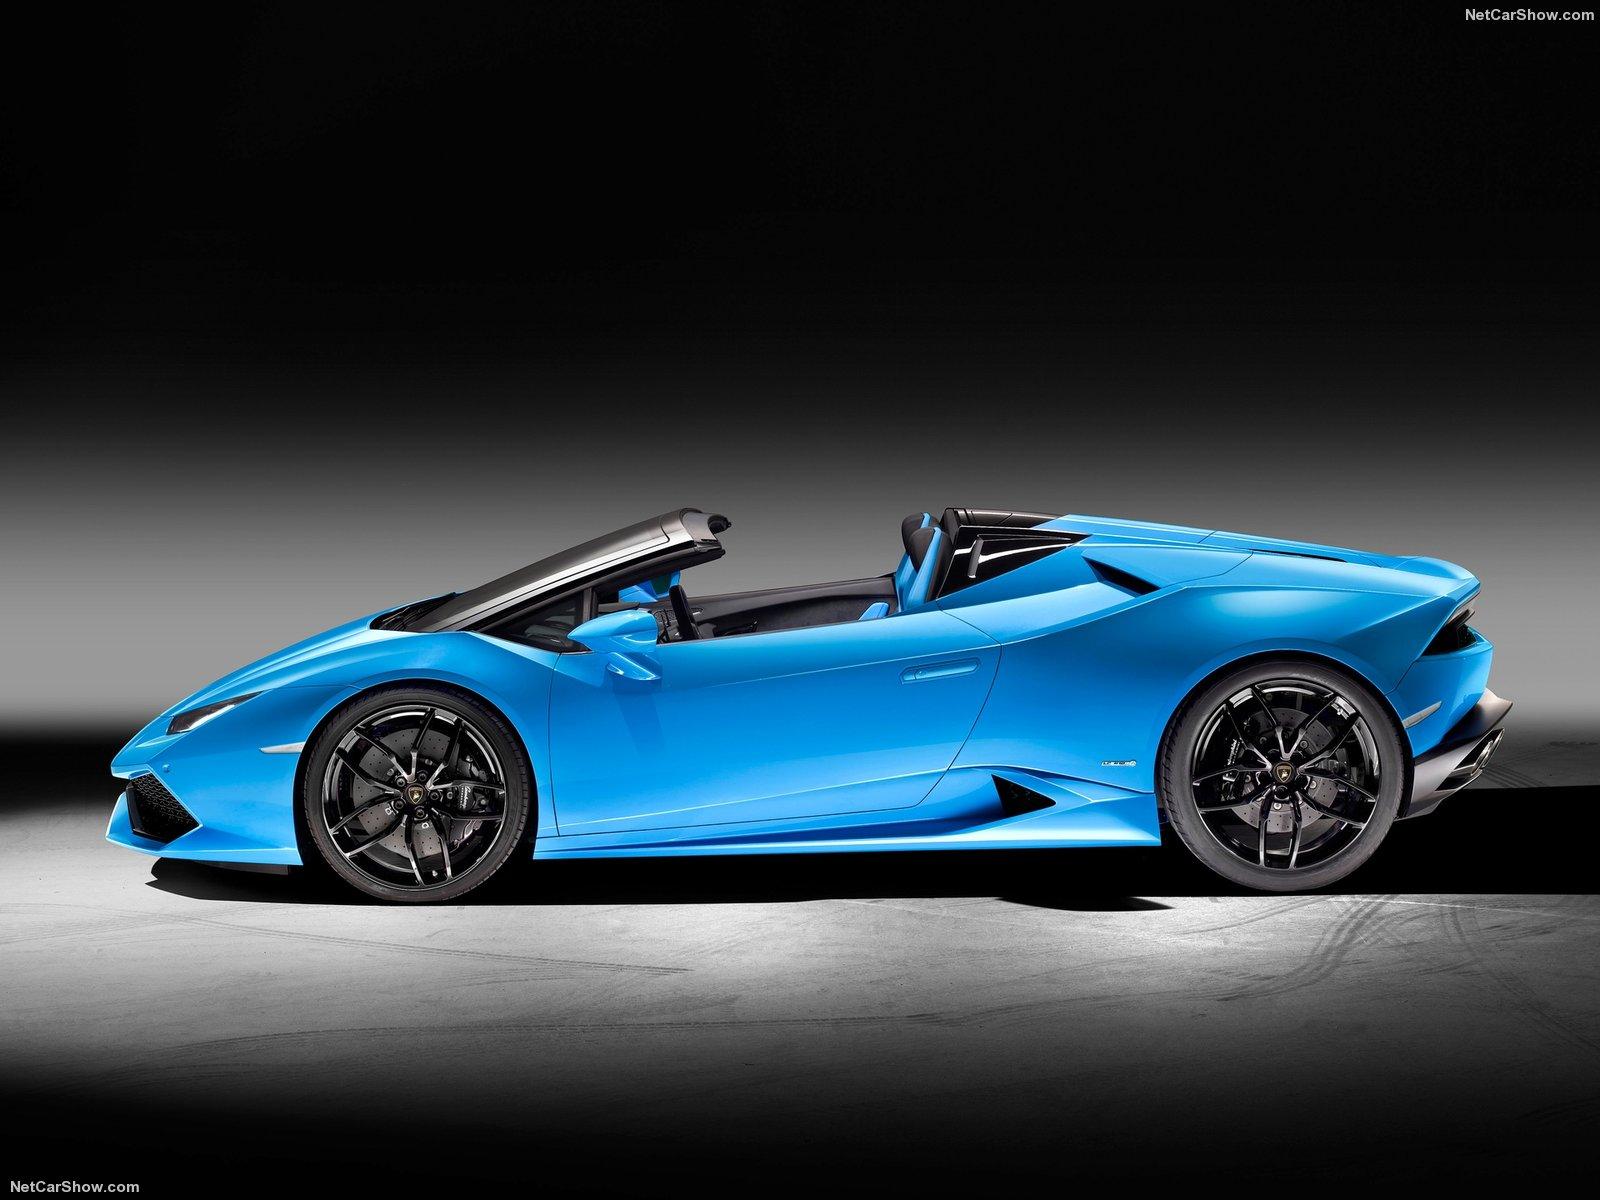 Lamborghini-Huracan_LP610-4_Spyder_2017_1600x1200_wallpaper_02.jpg